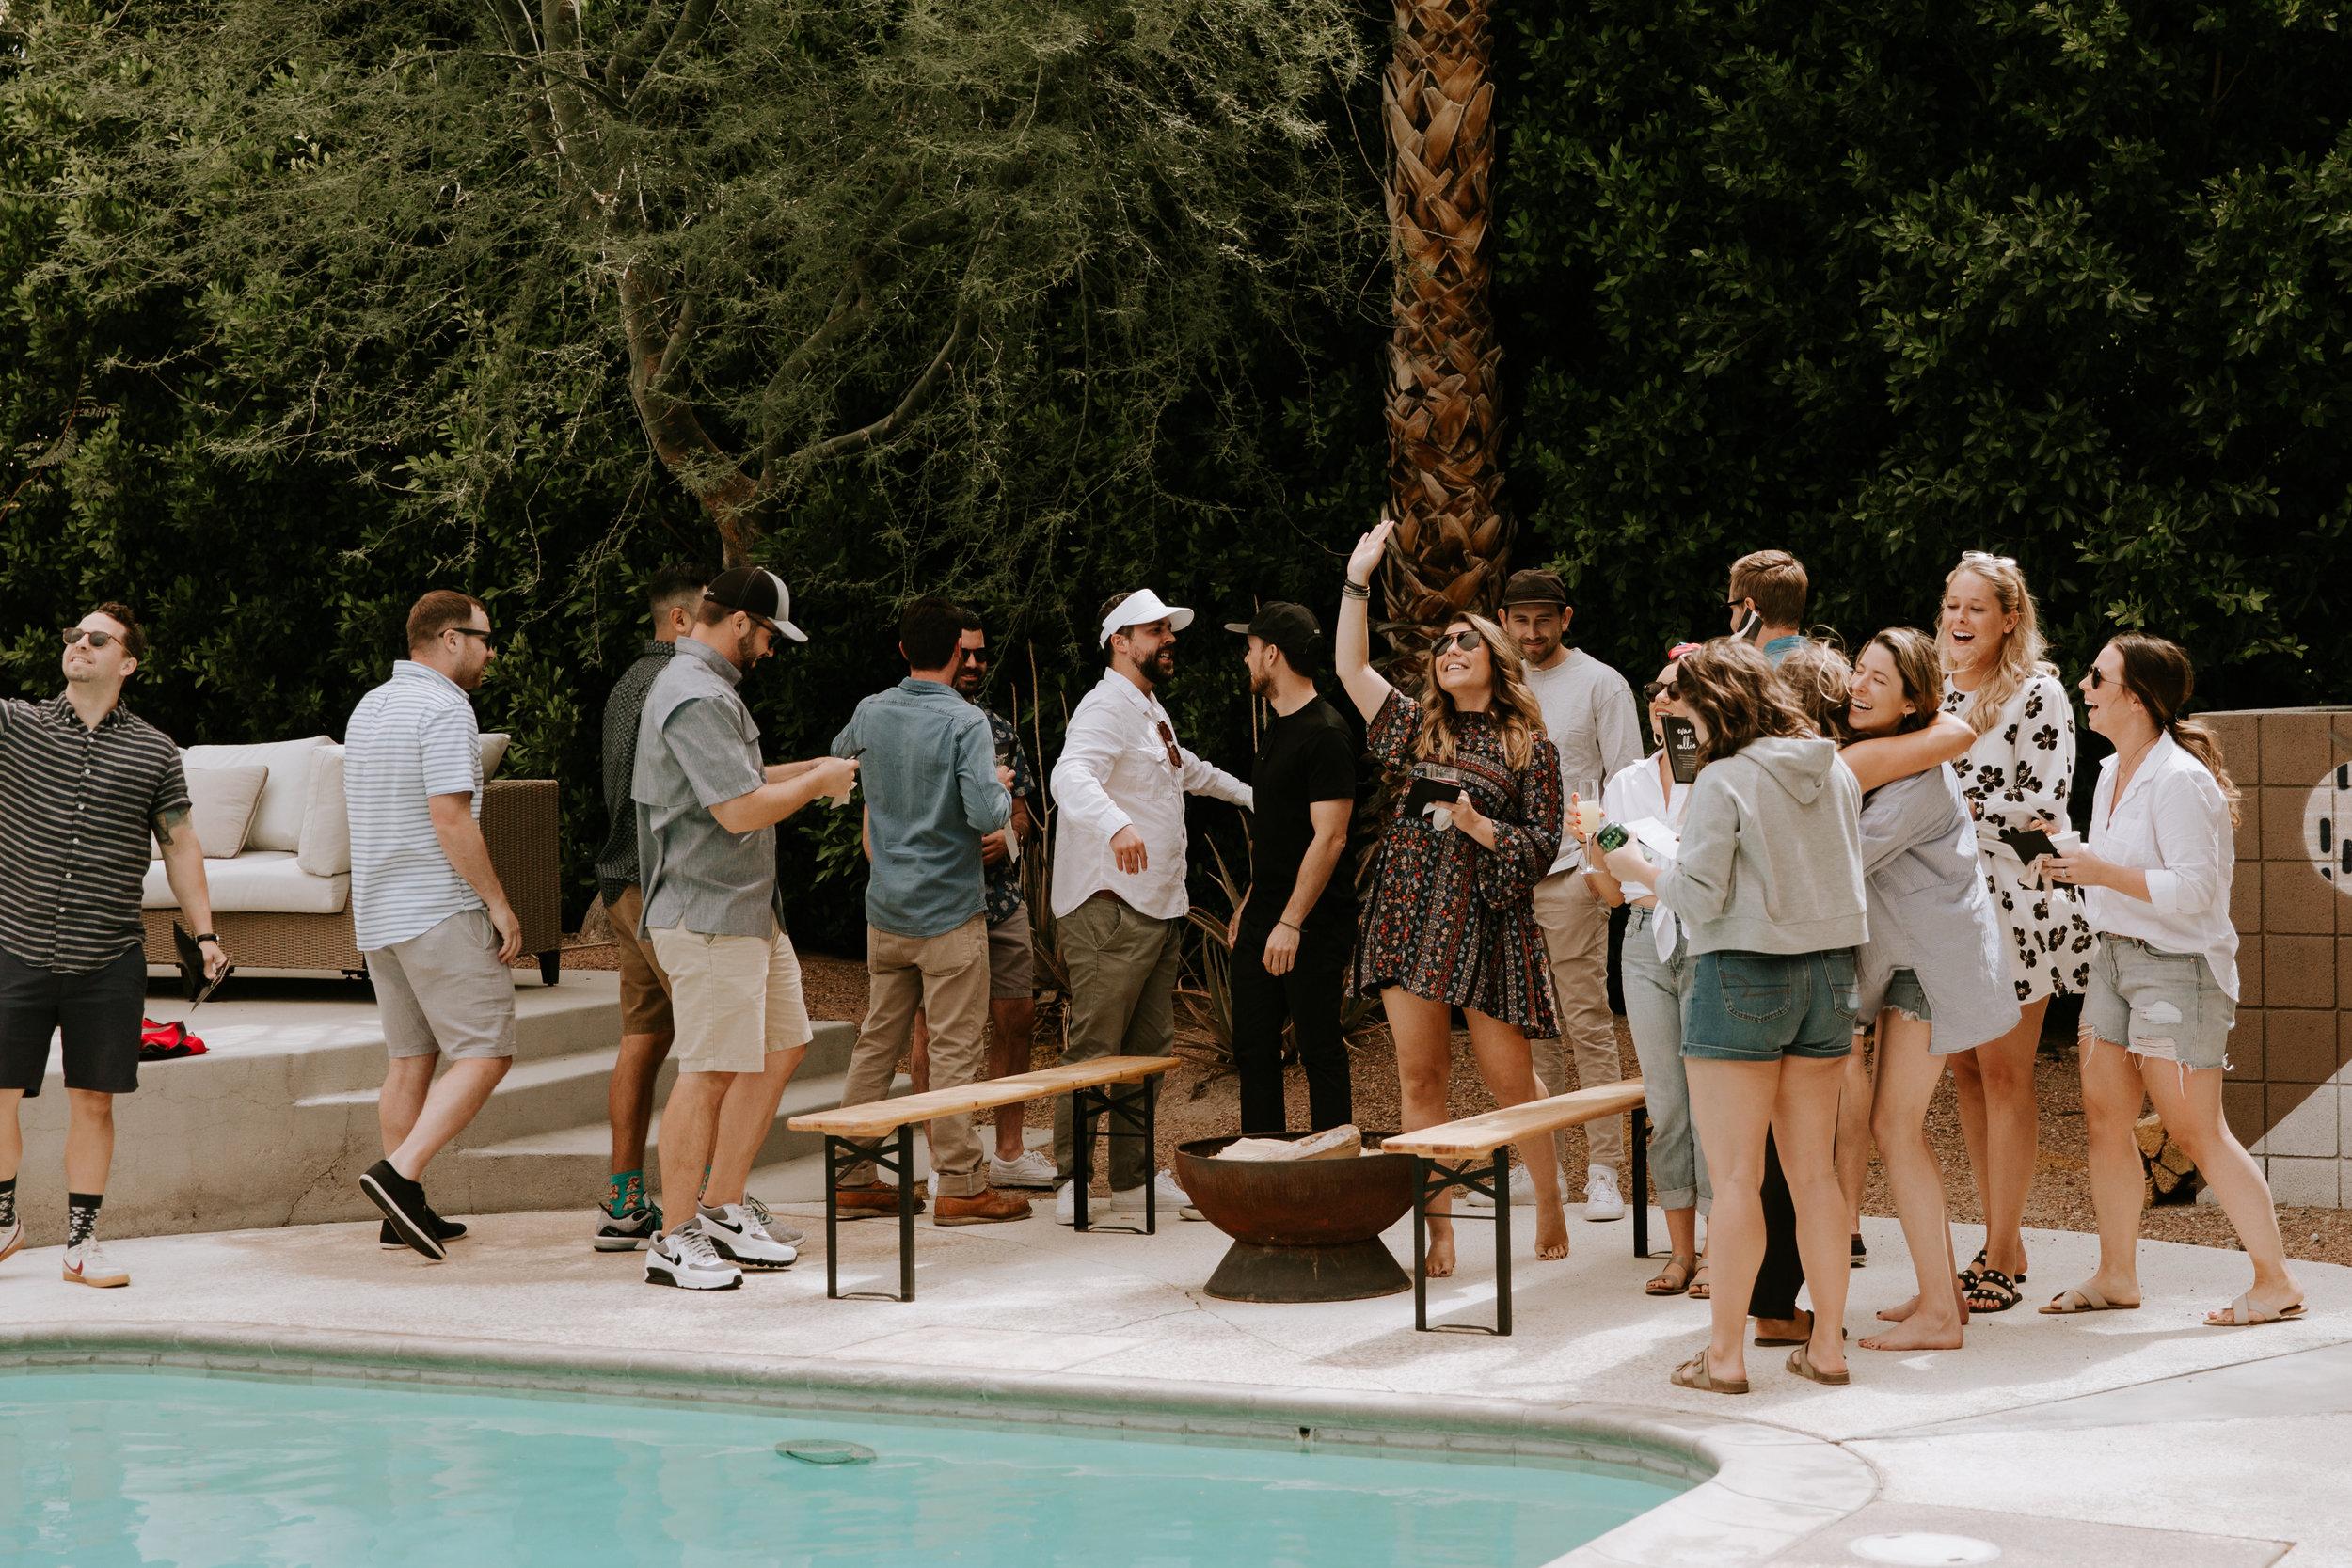 2019-05-26_Callie-Evan_Wedding_Joshua Tree_Paige Nelson_PREVIEWS HR-1.jpg